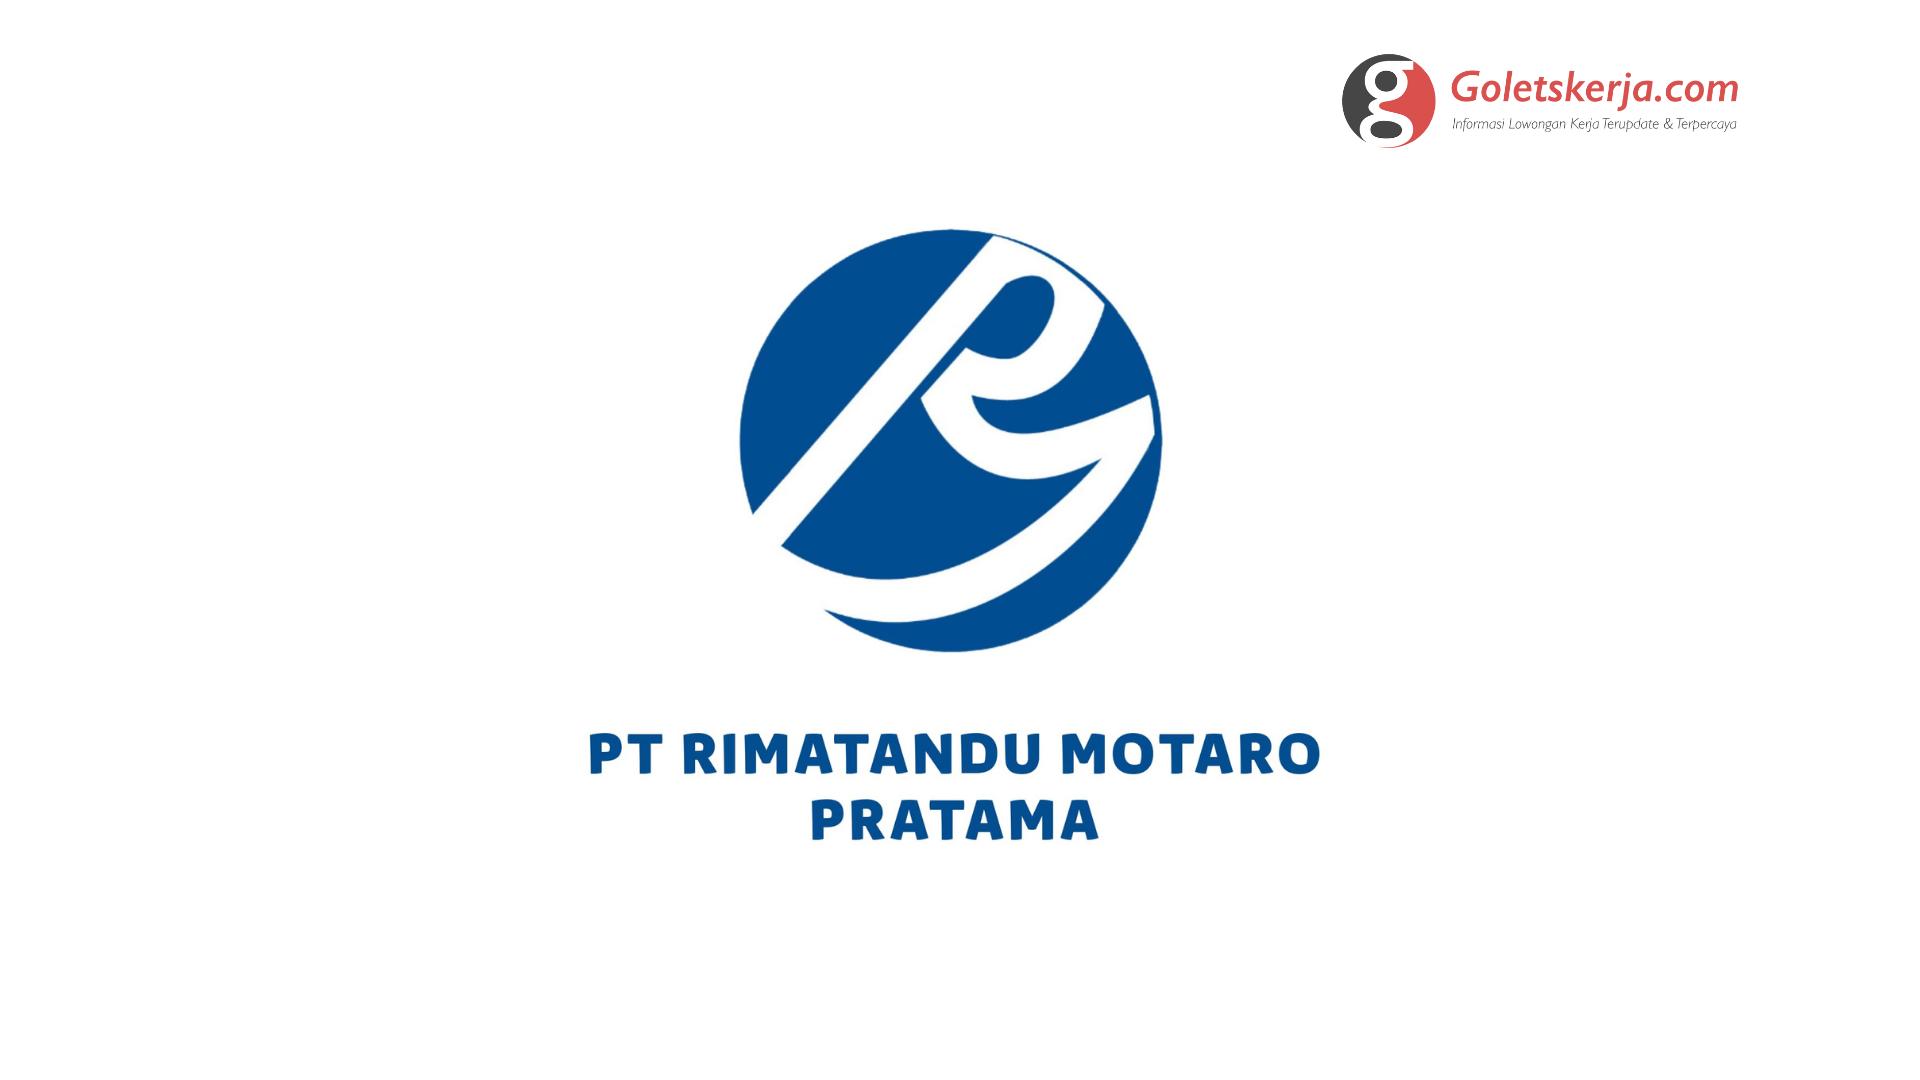 Lowongan Kerja PT Rimatandu Motaro Pratama